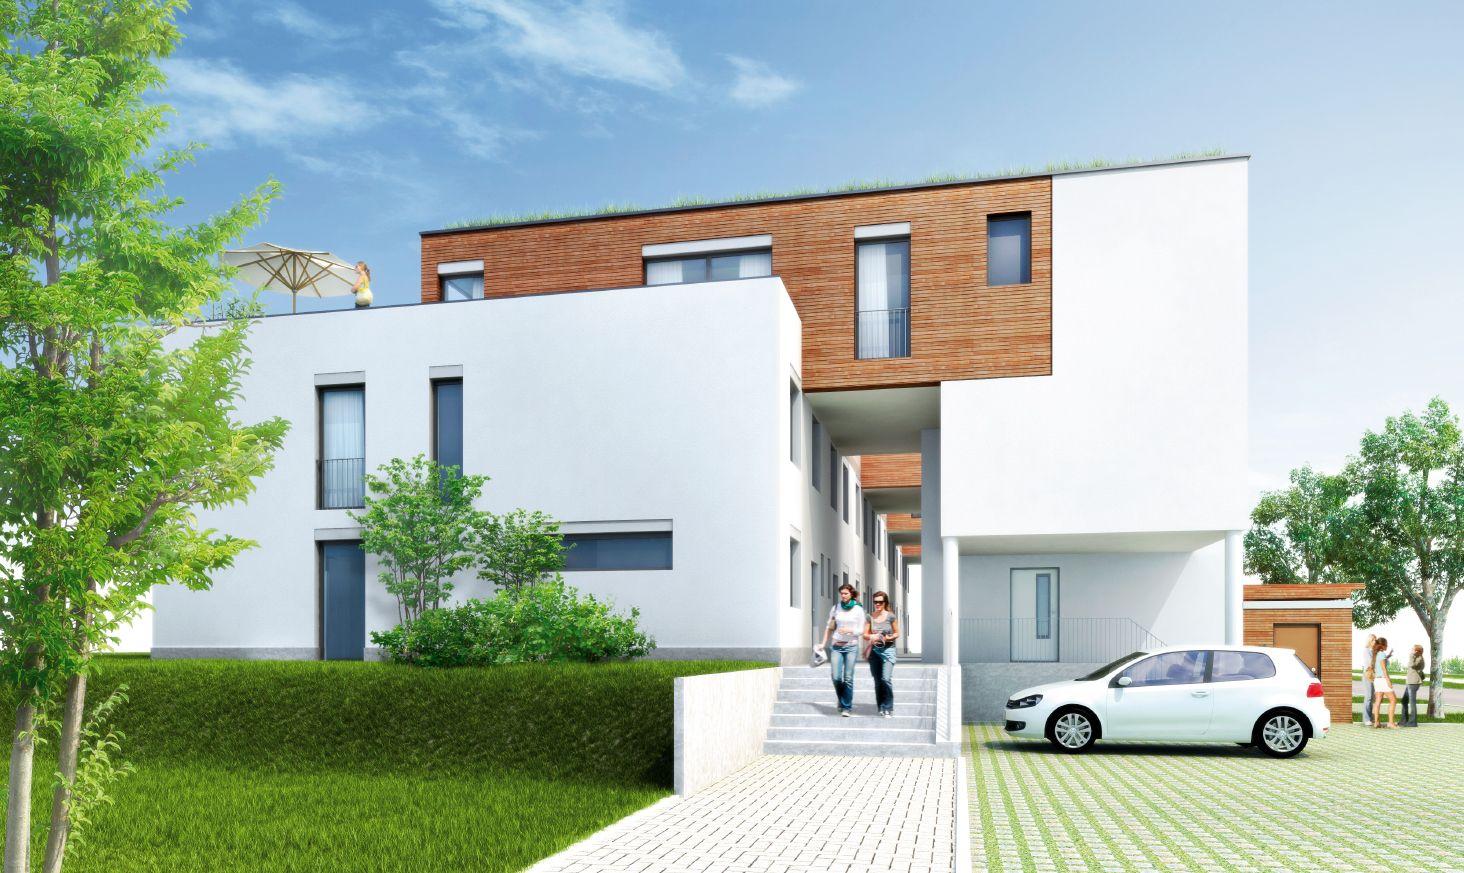 Immobilien / Projekt der One Group in München